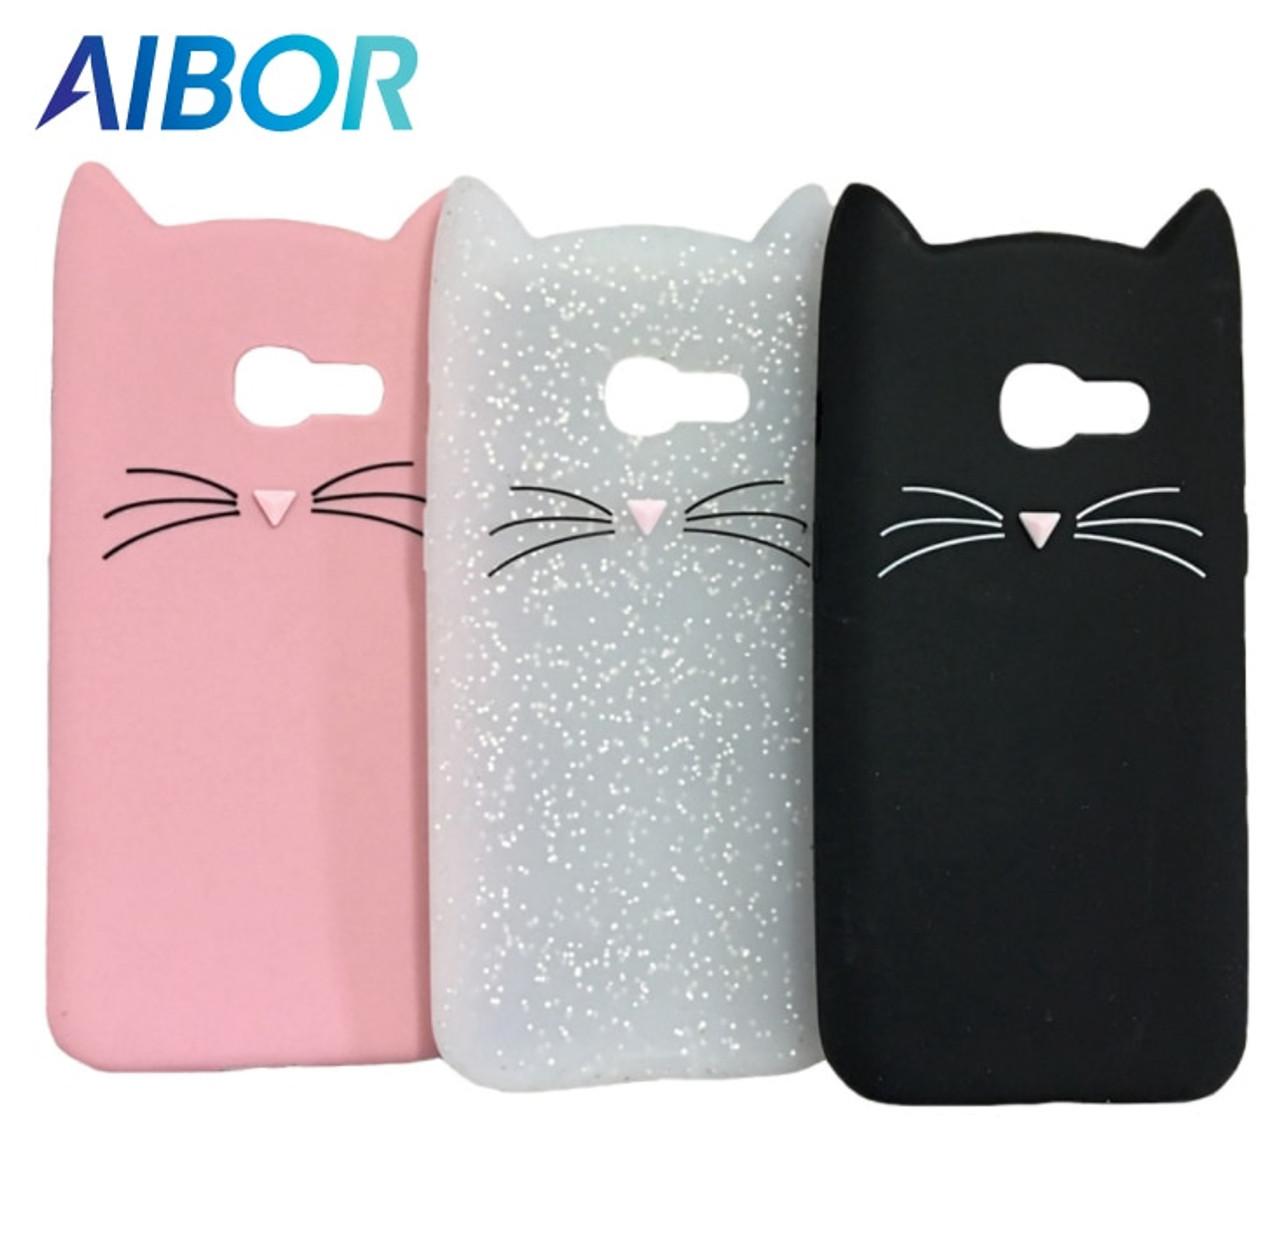 reputable site 272ee 23aa8 3D cute cartoon Mustache beard cat Ear soft silicone case for Samsung  Galaxy A5 A3 2017/16 S8 S9 J4 J6 J8 A6 A8 Plus 2018 cover